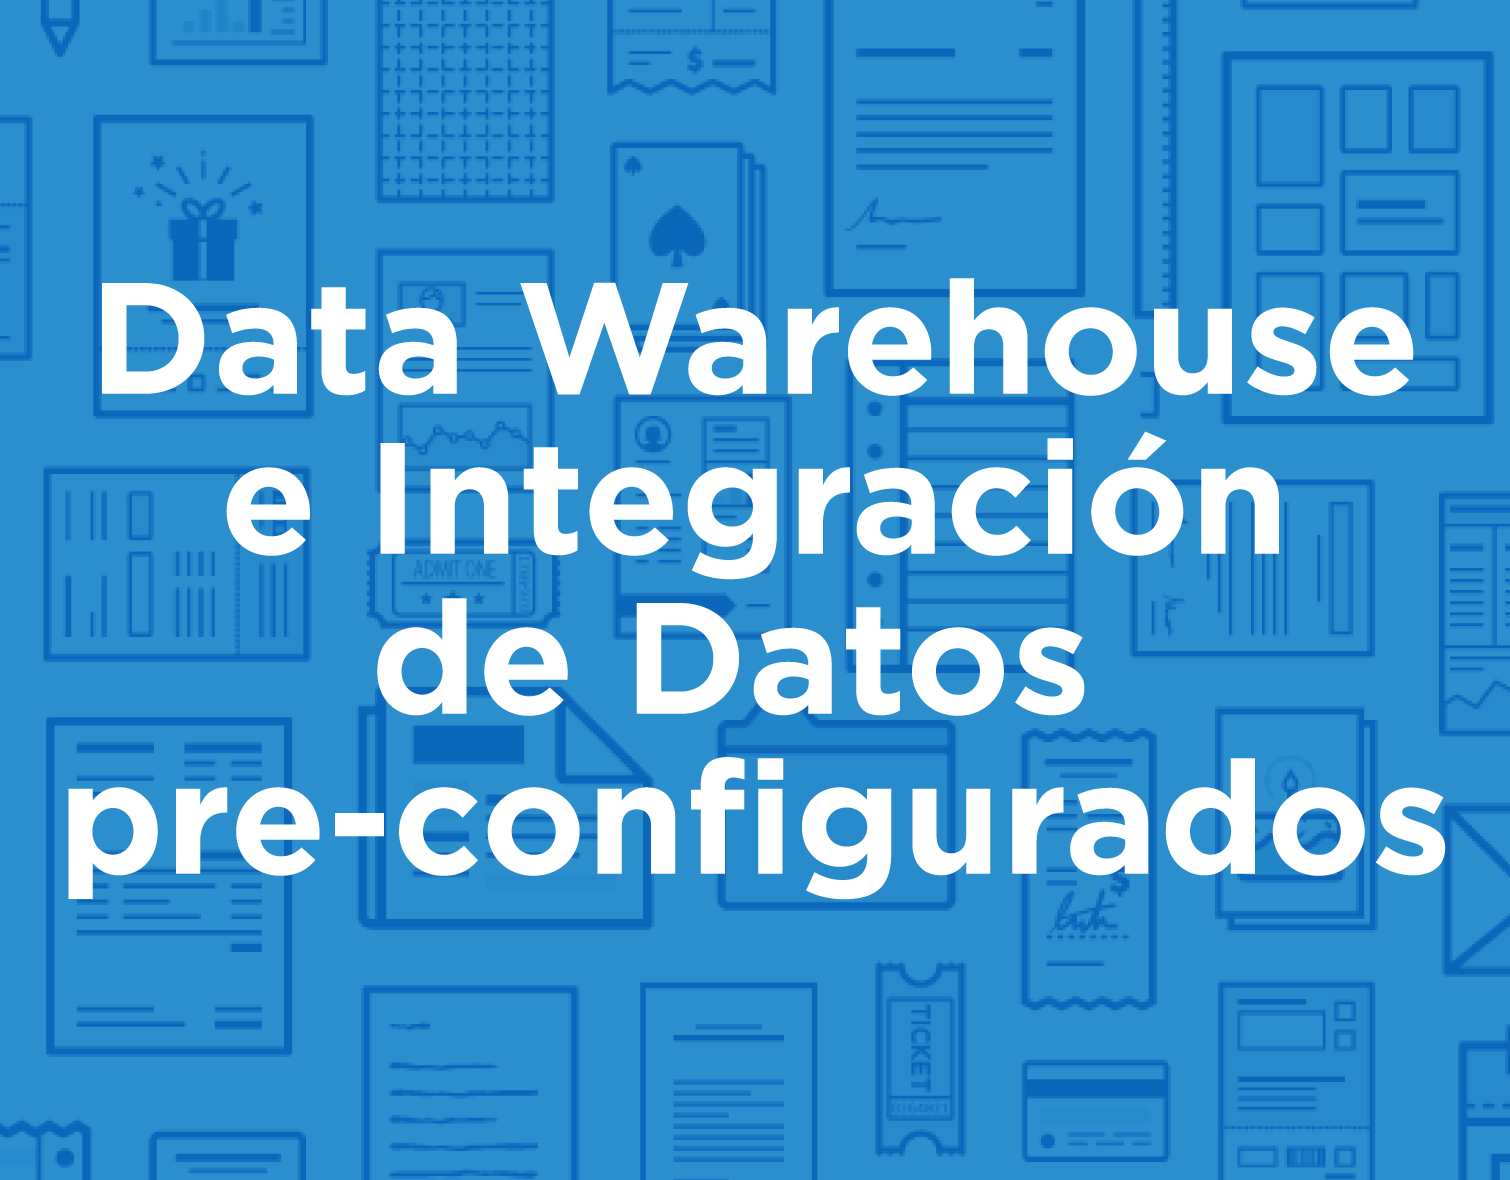 icon_products_spa_Data-Warehouse-e-Integracion-Datos.jpg